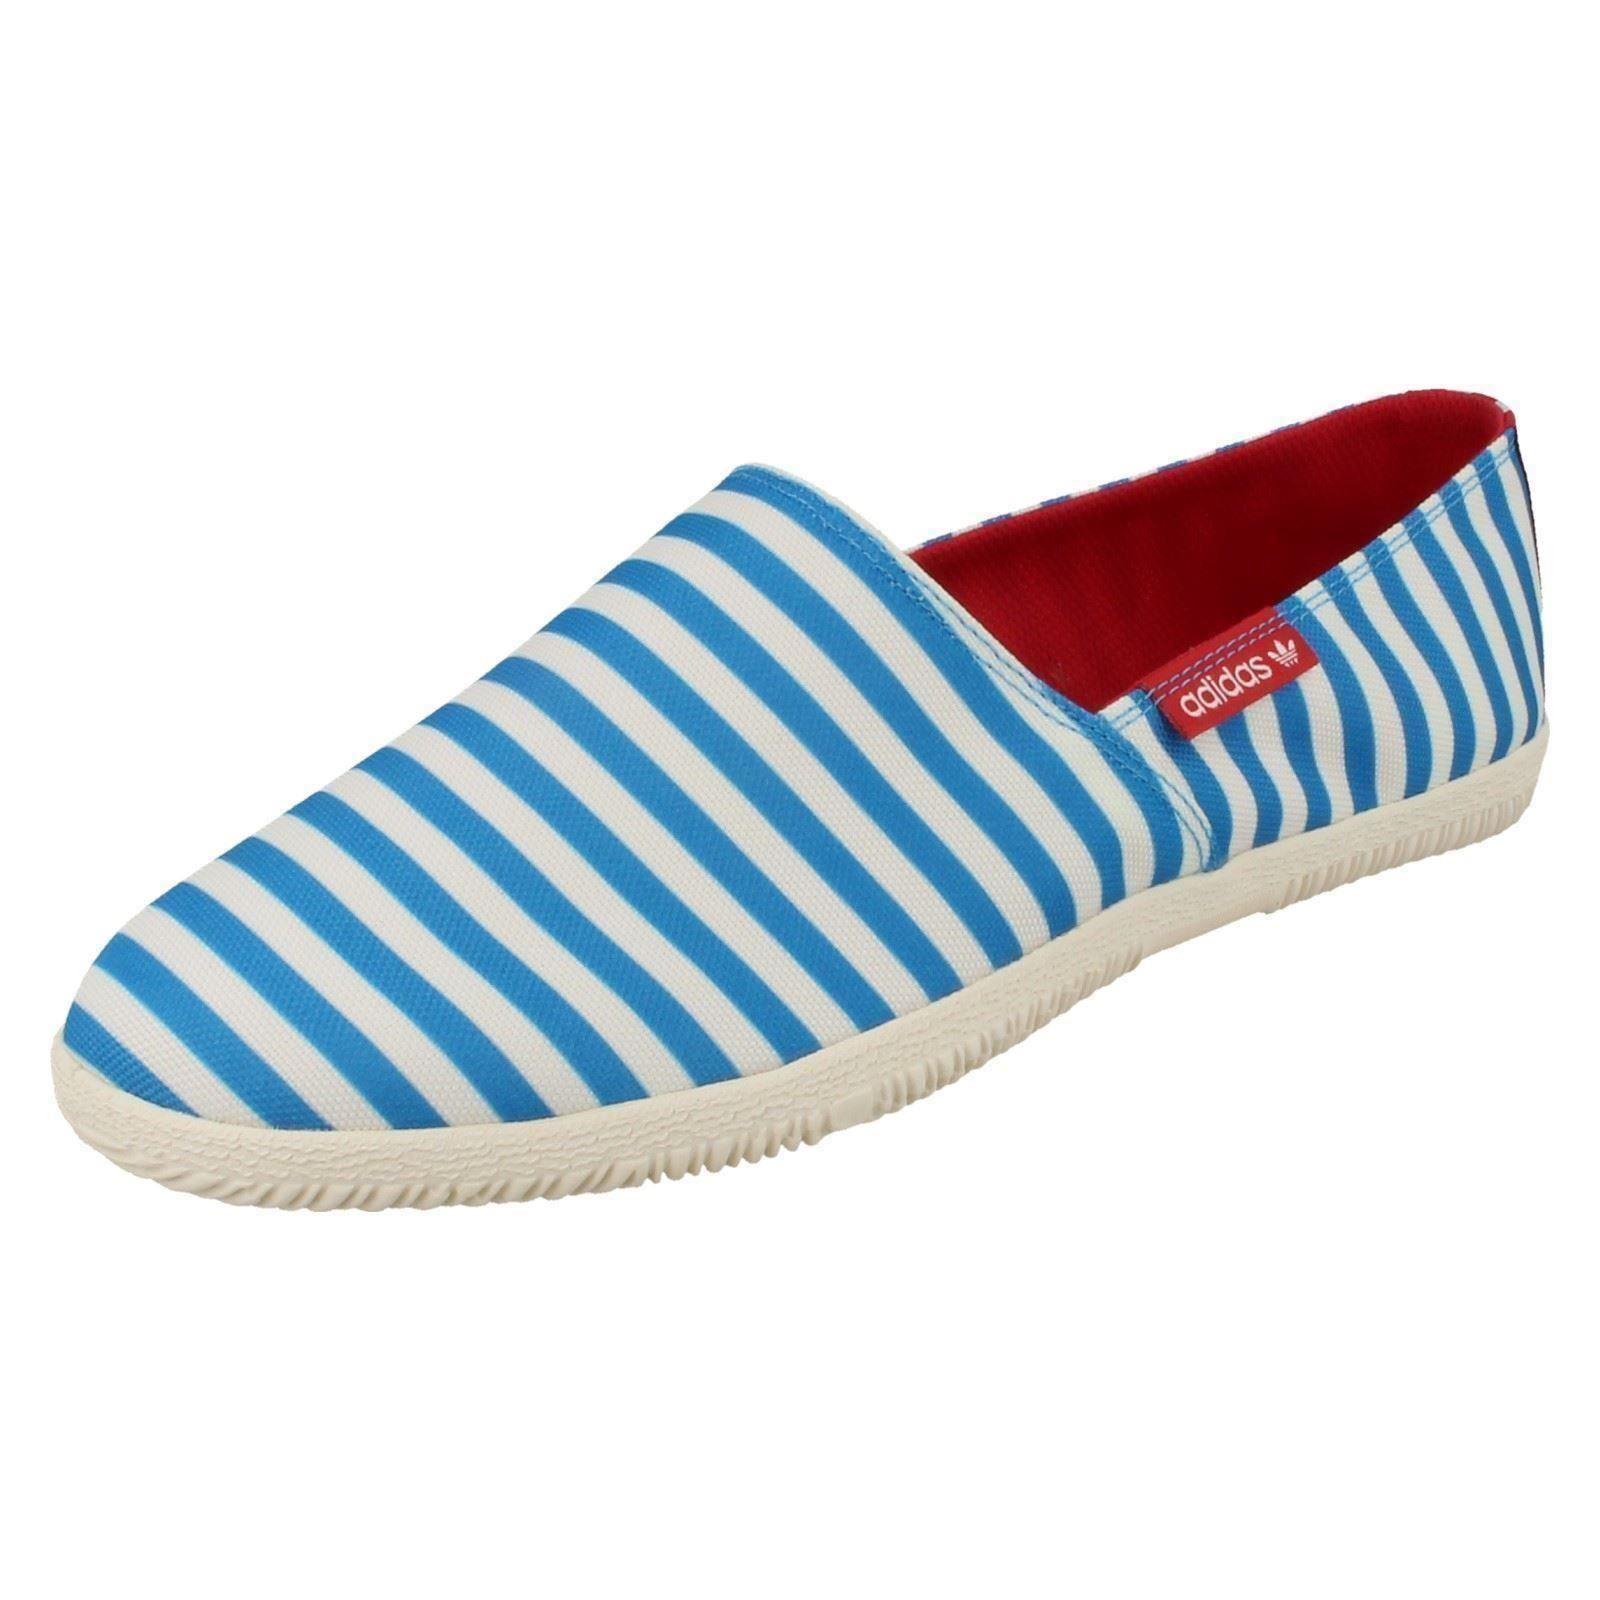 Adidas Adidrill D65185 Mens bluee Stripe Slip On Textile Pumps (R7A)